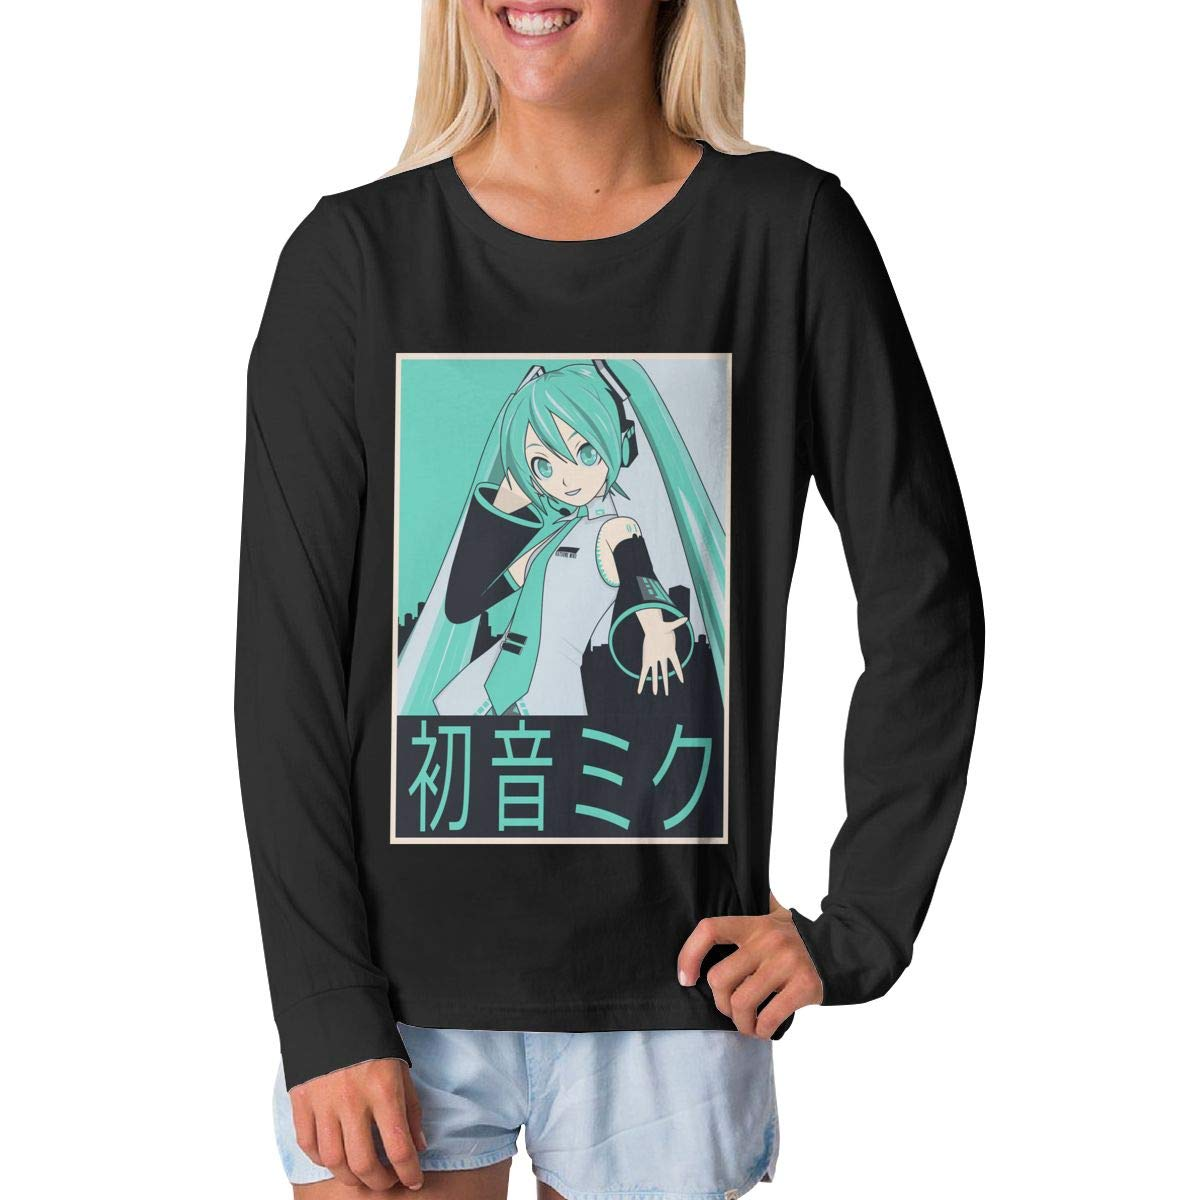 BilliePhillips Youth Hatsune Miku Fashion Long Sleeve T-Shirt